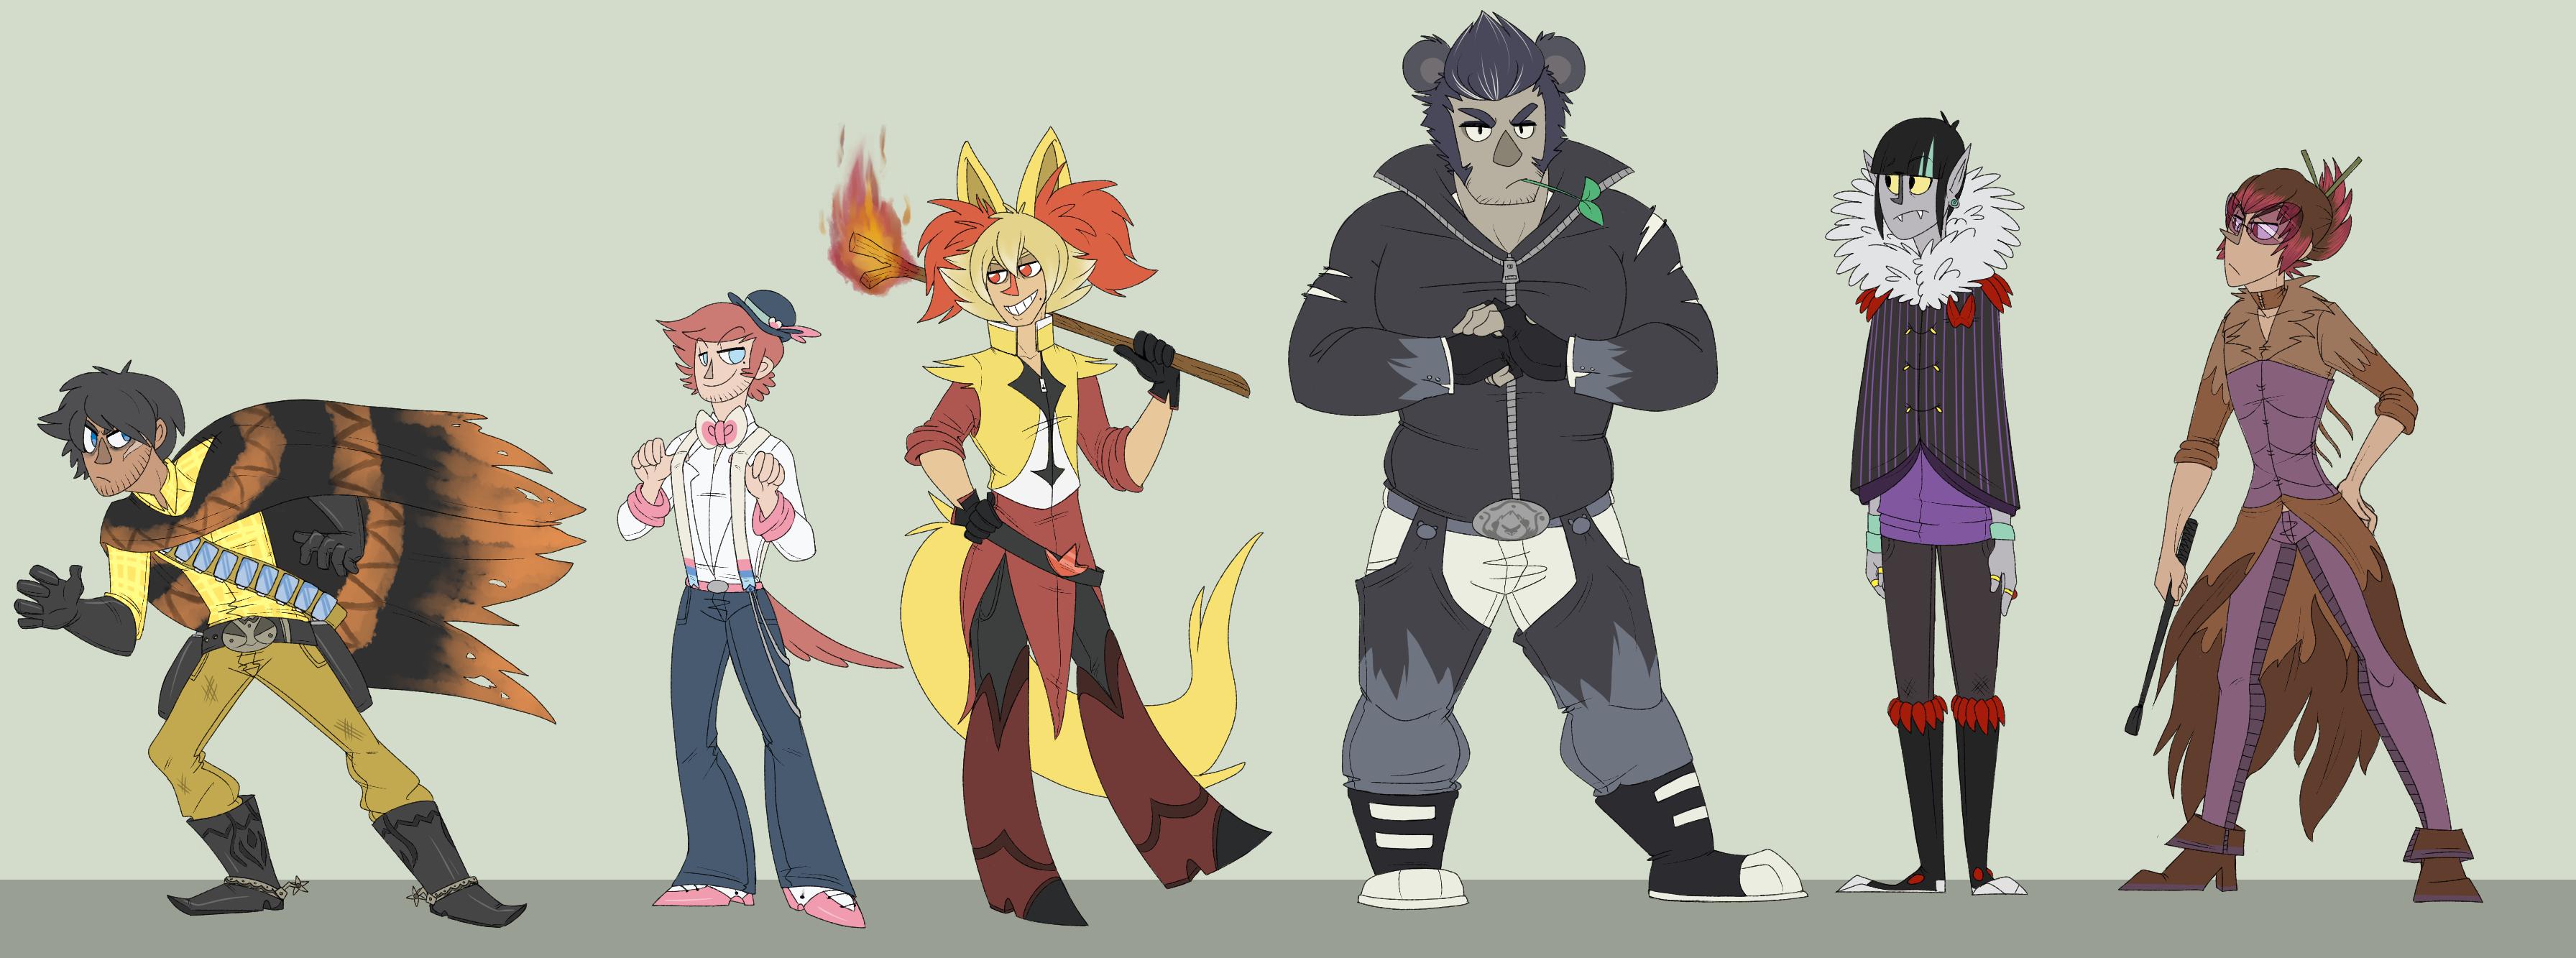 pokemon y gijinka team � weasyl